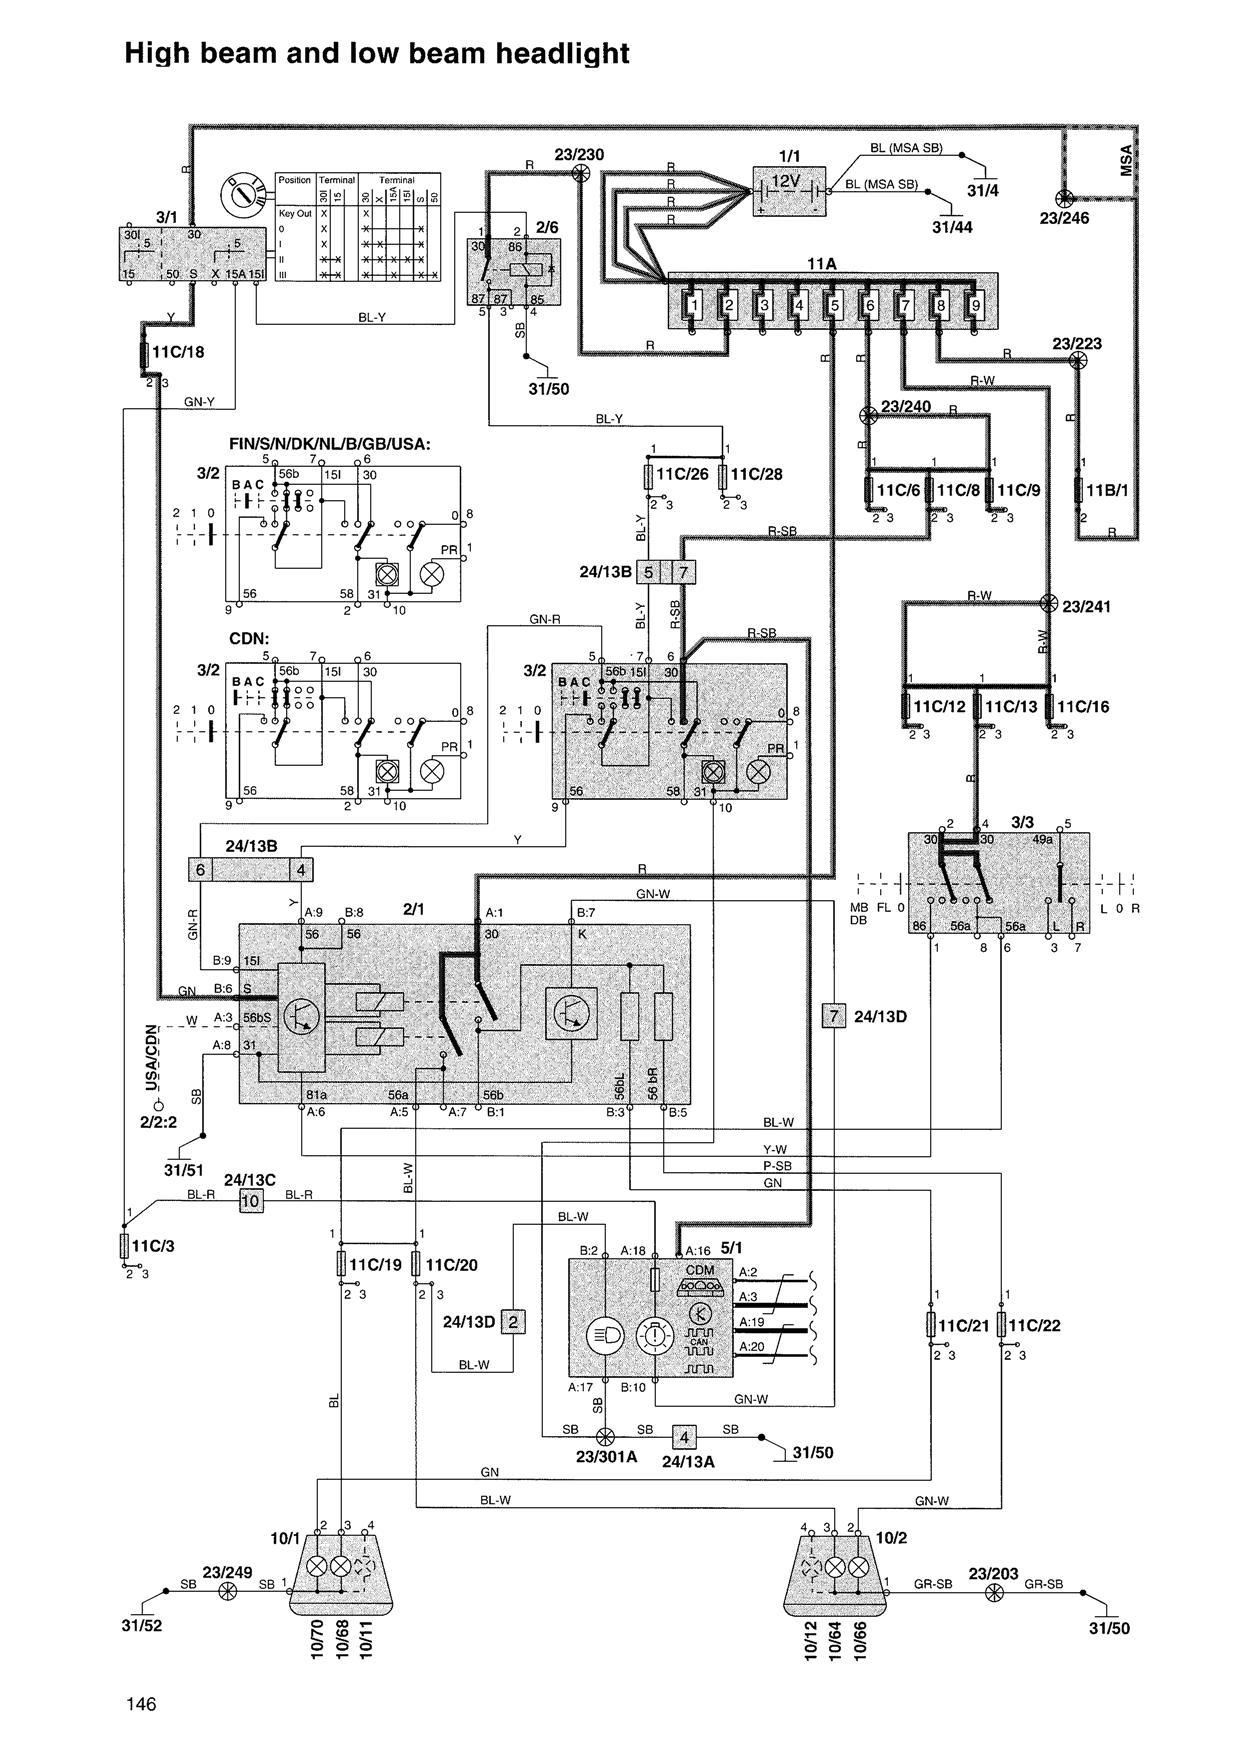 volvo xc90 wiring diagram wiring diagram 06 volvo xc90 wiring diagram image about